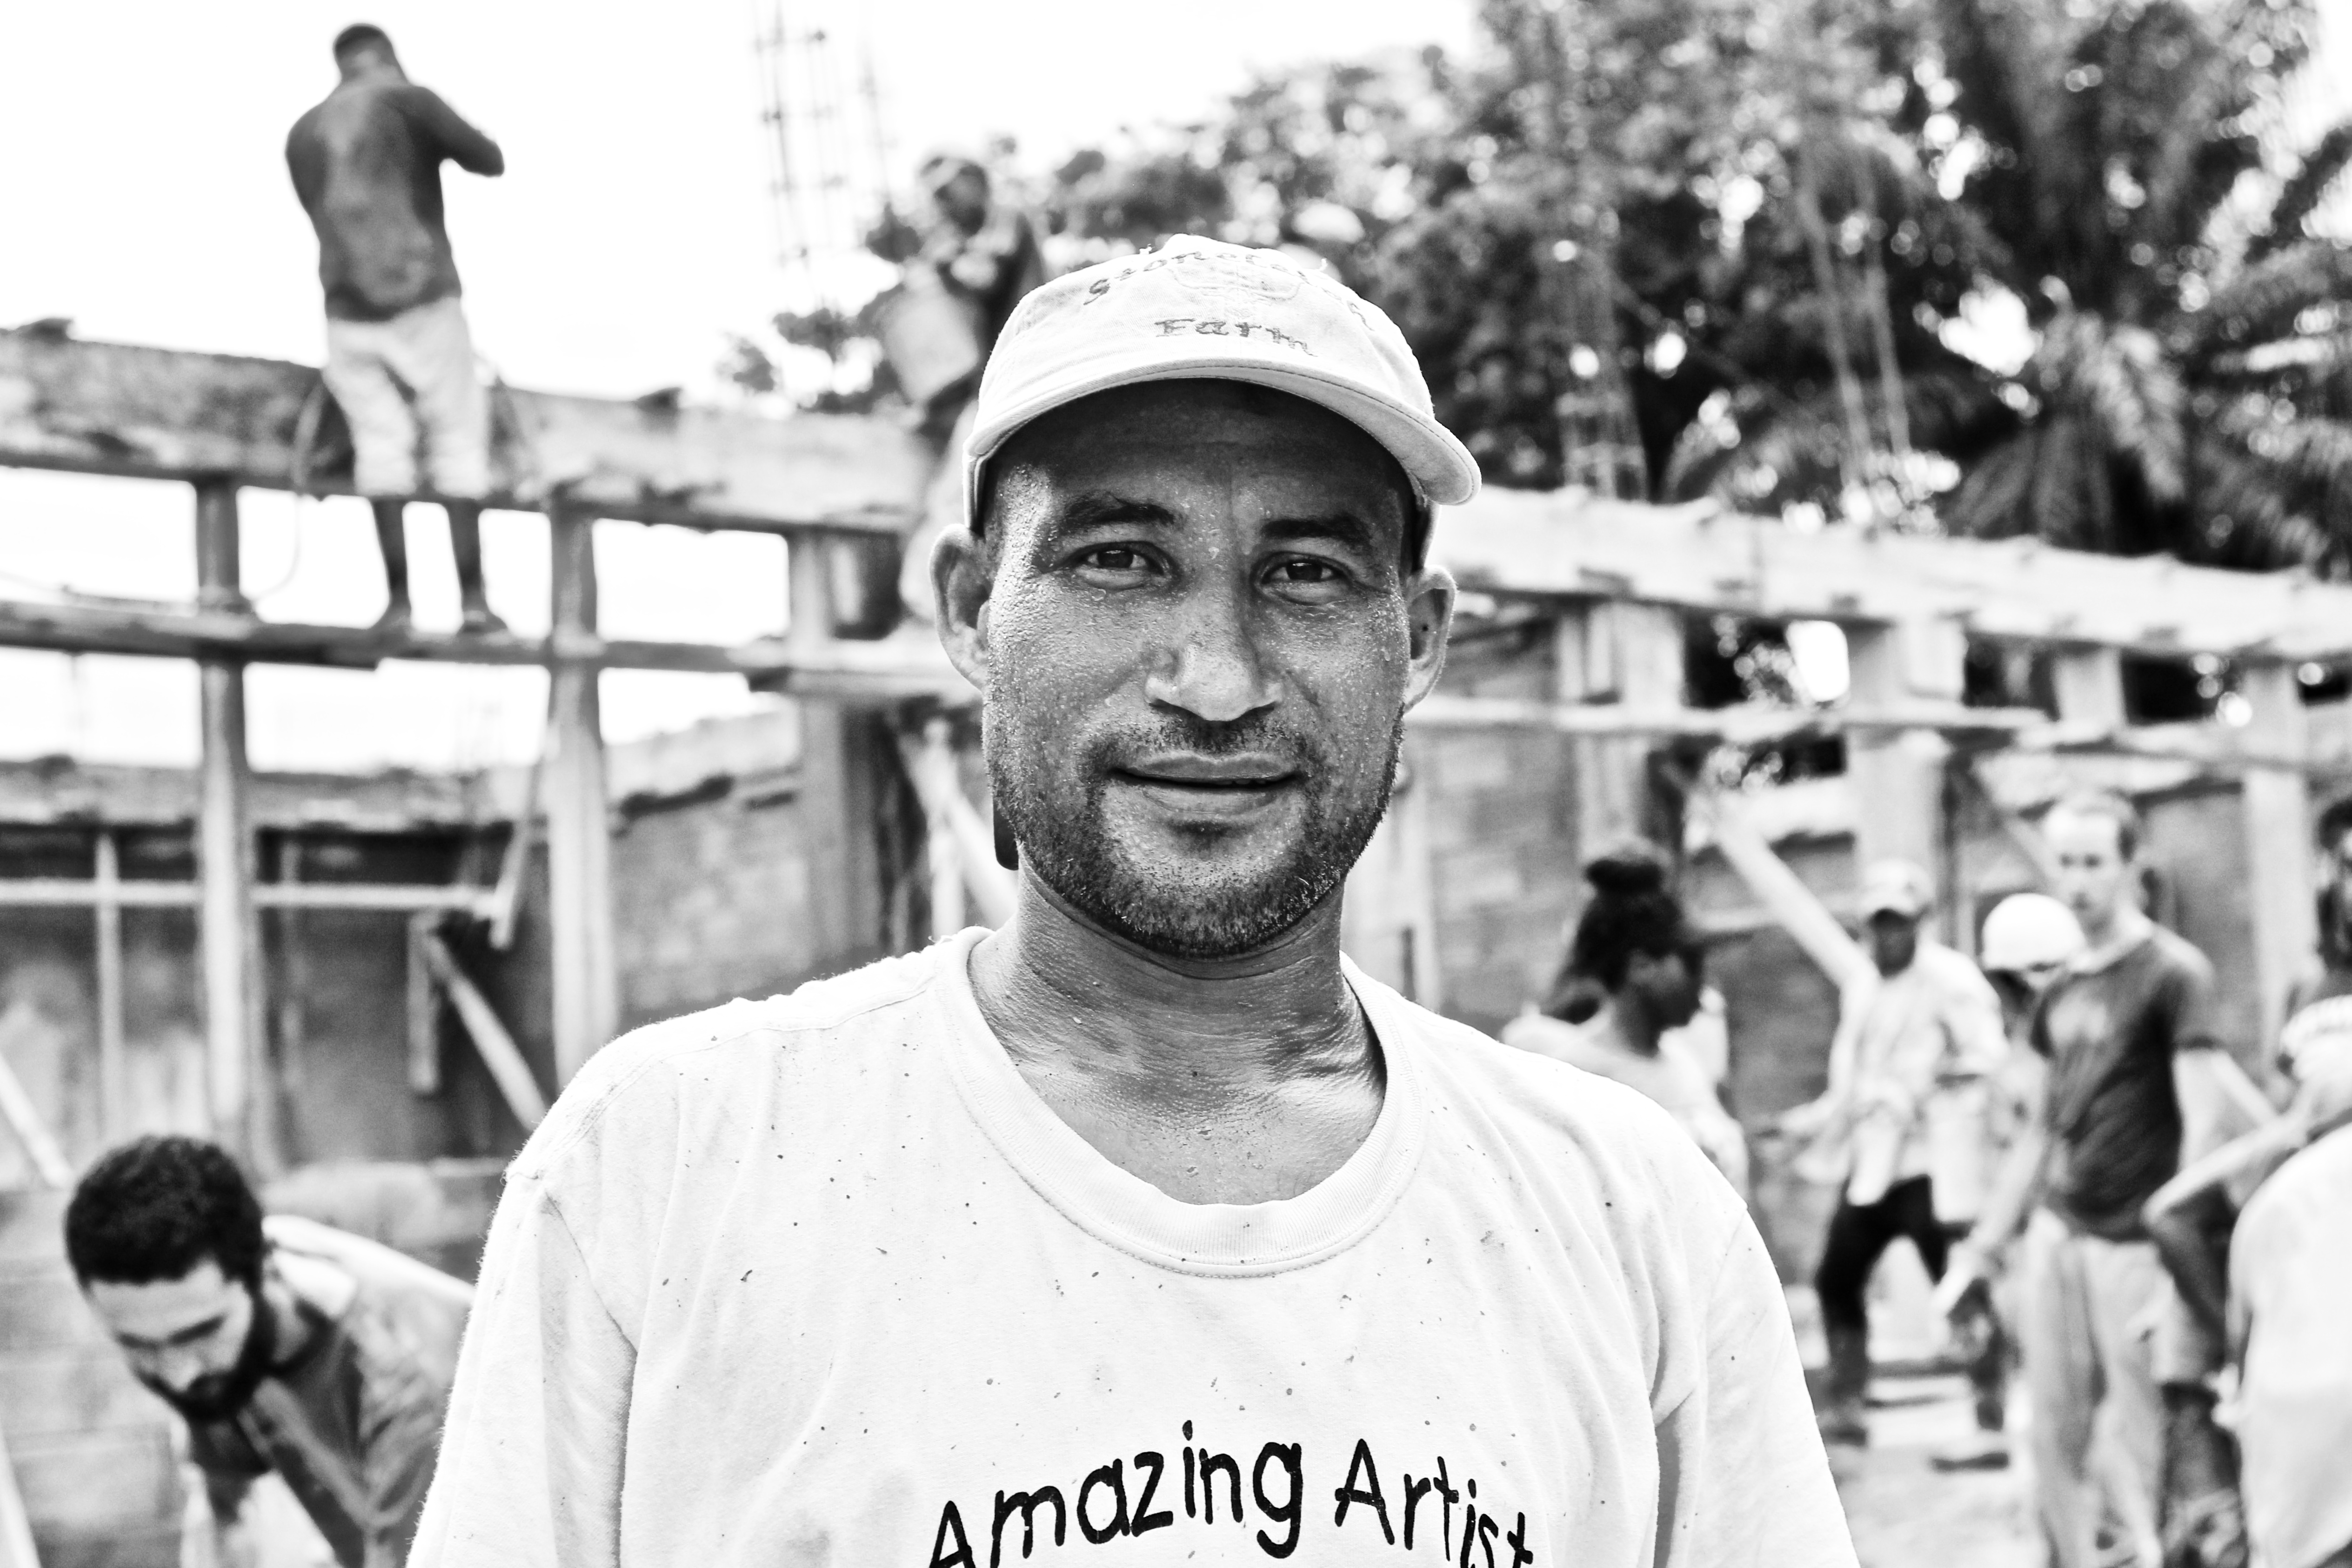 Meet Antonio Reyes, Mason on the Schools Construction Team